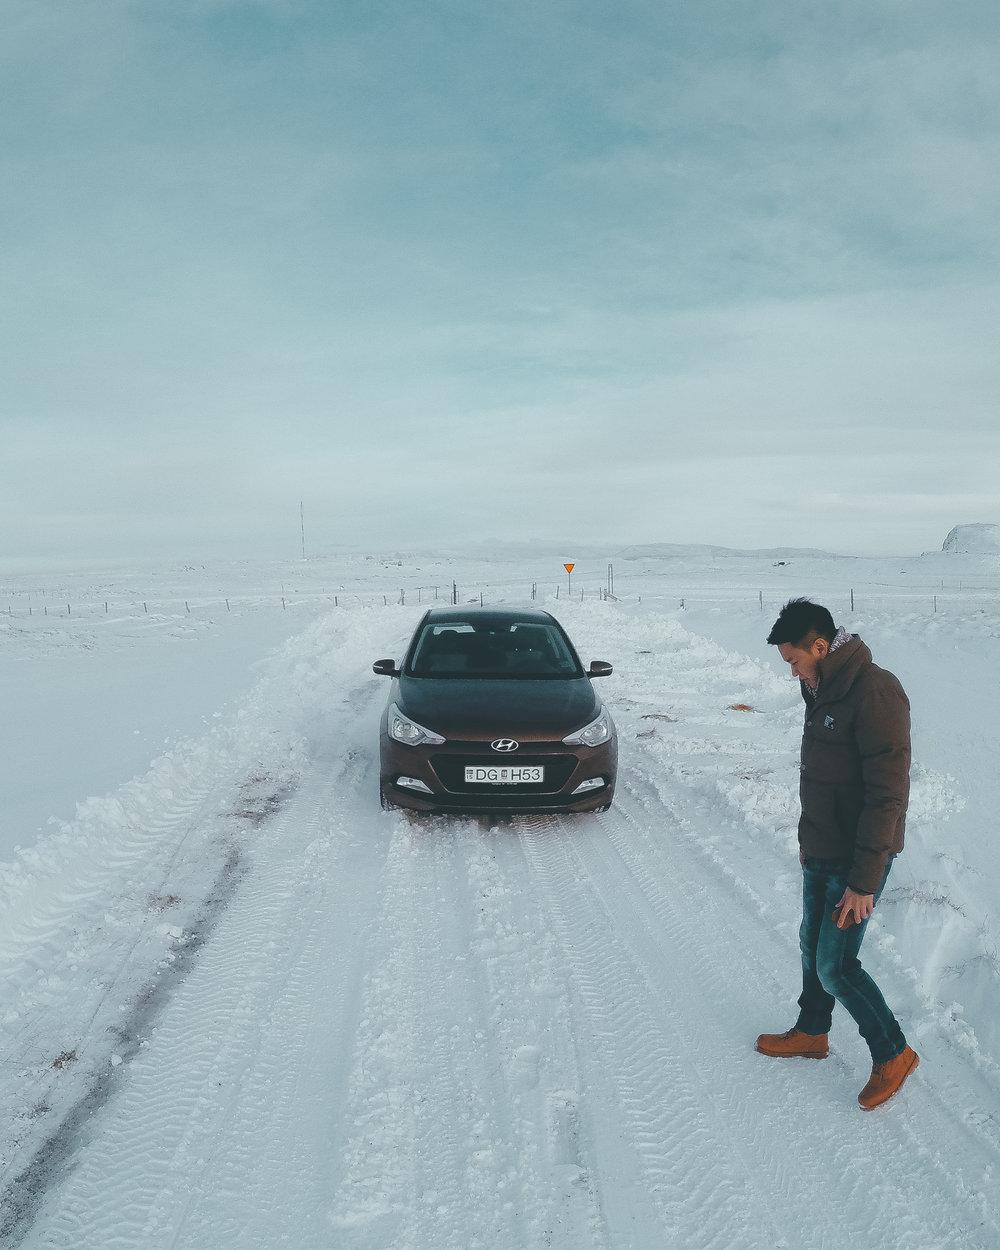 iceland snowy-2675-2.jpg